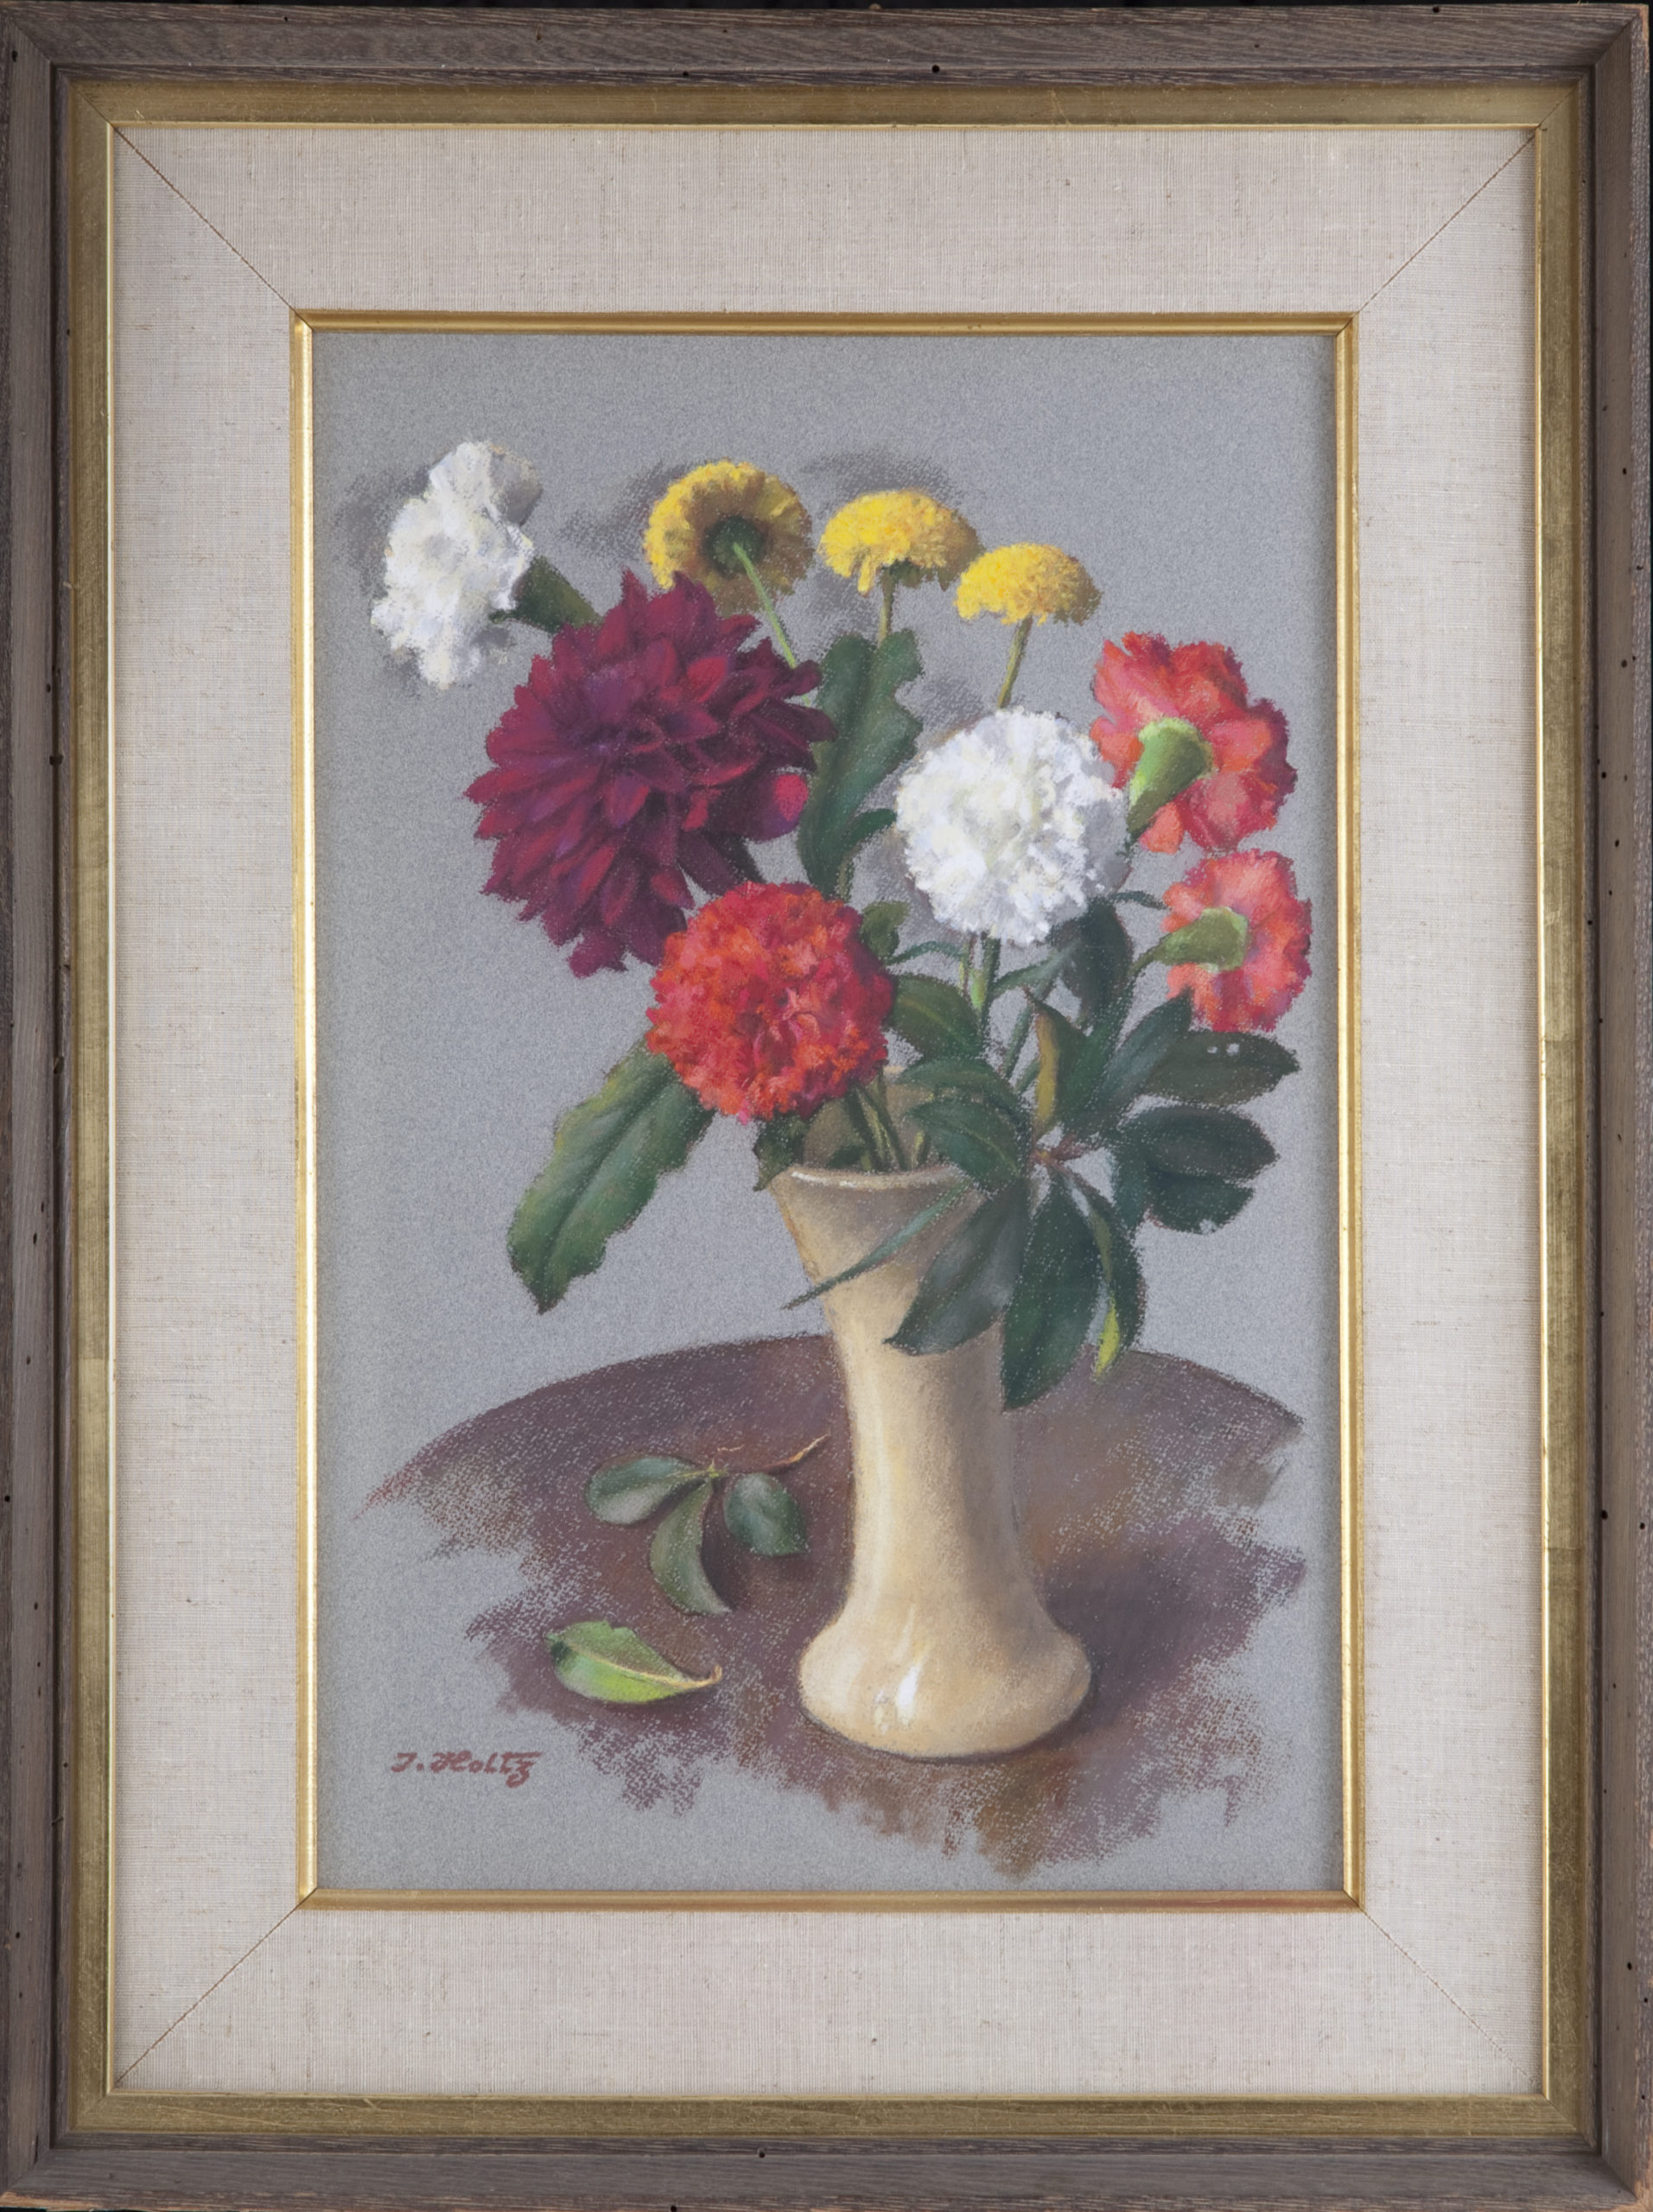 152 Carnations in Vase Still Life 1958 - Pastel - 19 x 12 - Frame: 26.25 x 19.75 x 2.25